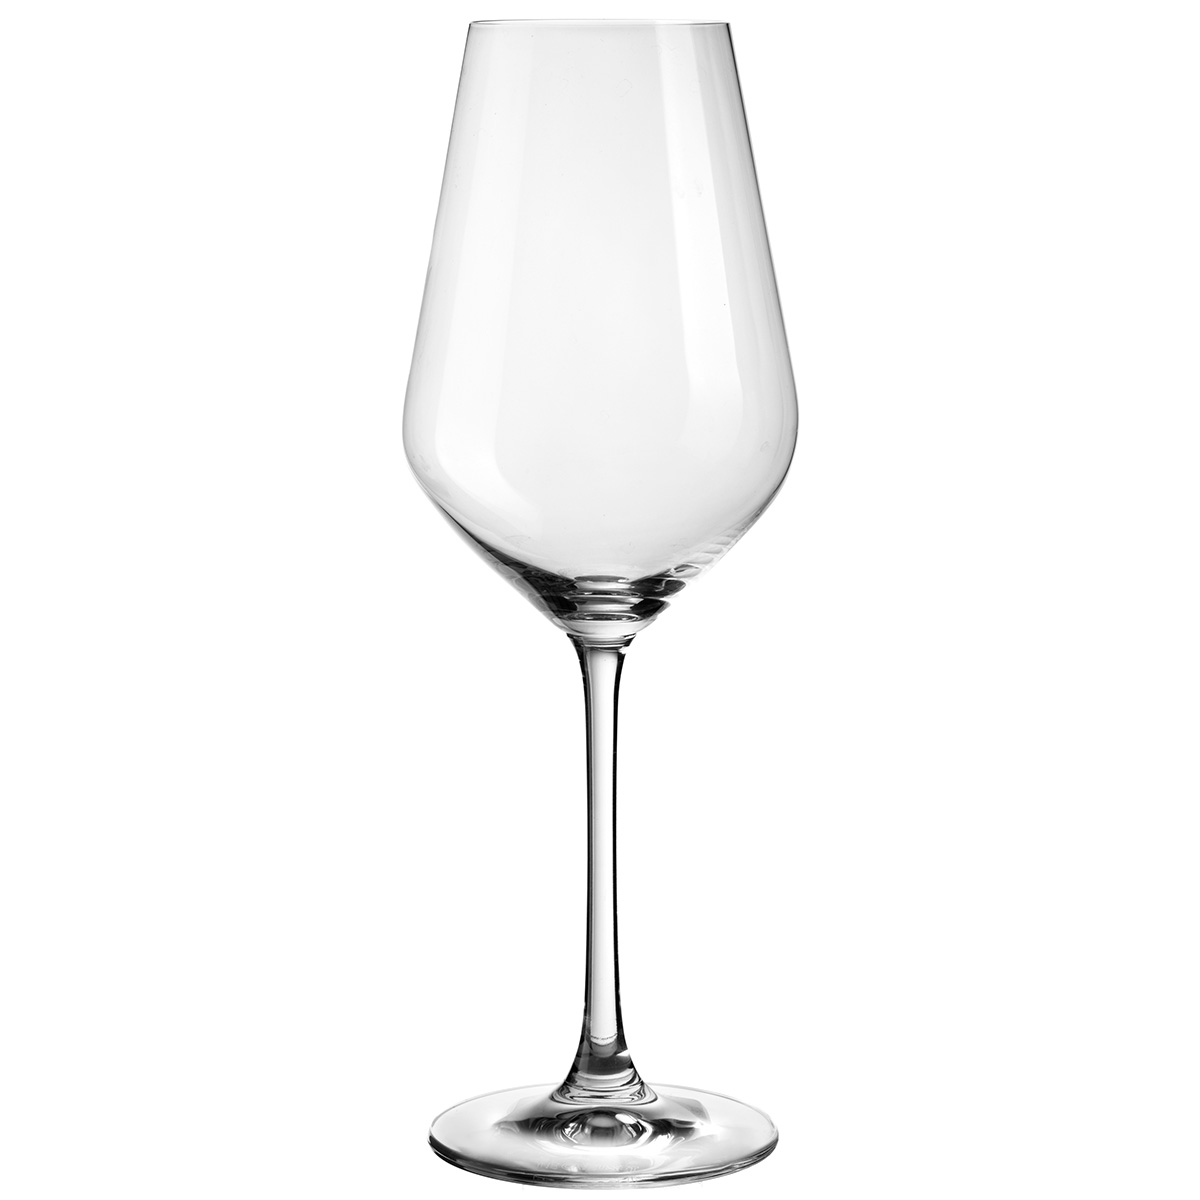 Image of   Le Creuset vinglas - 4 stk.